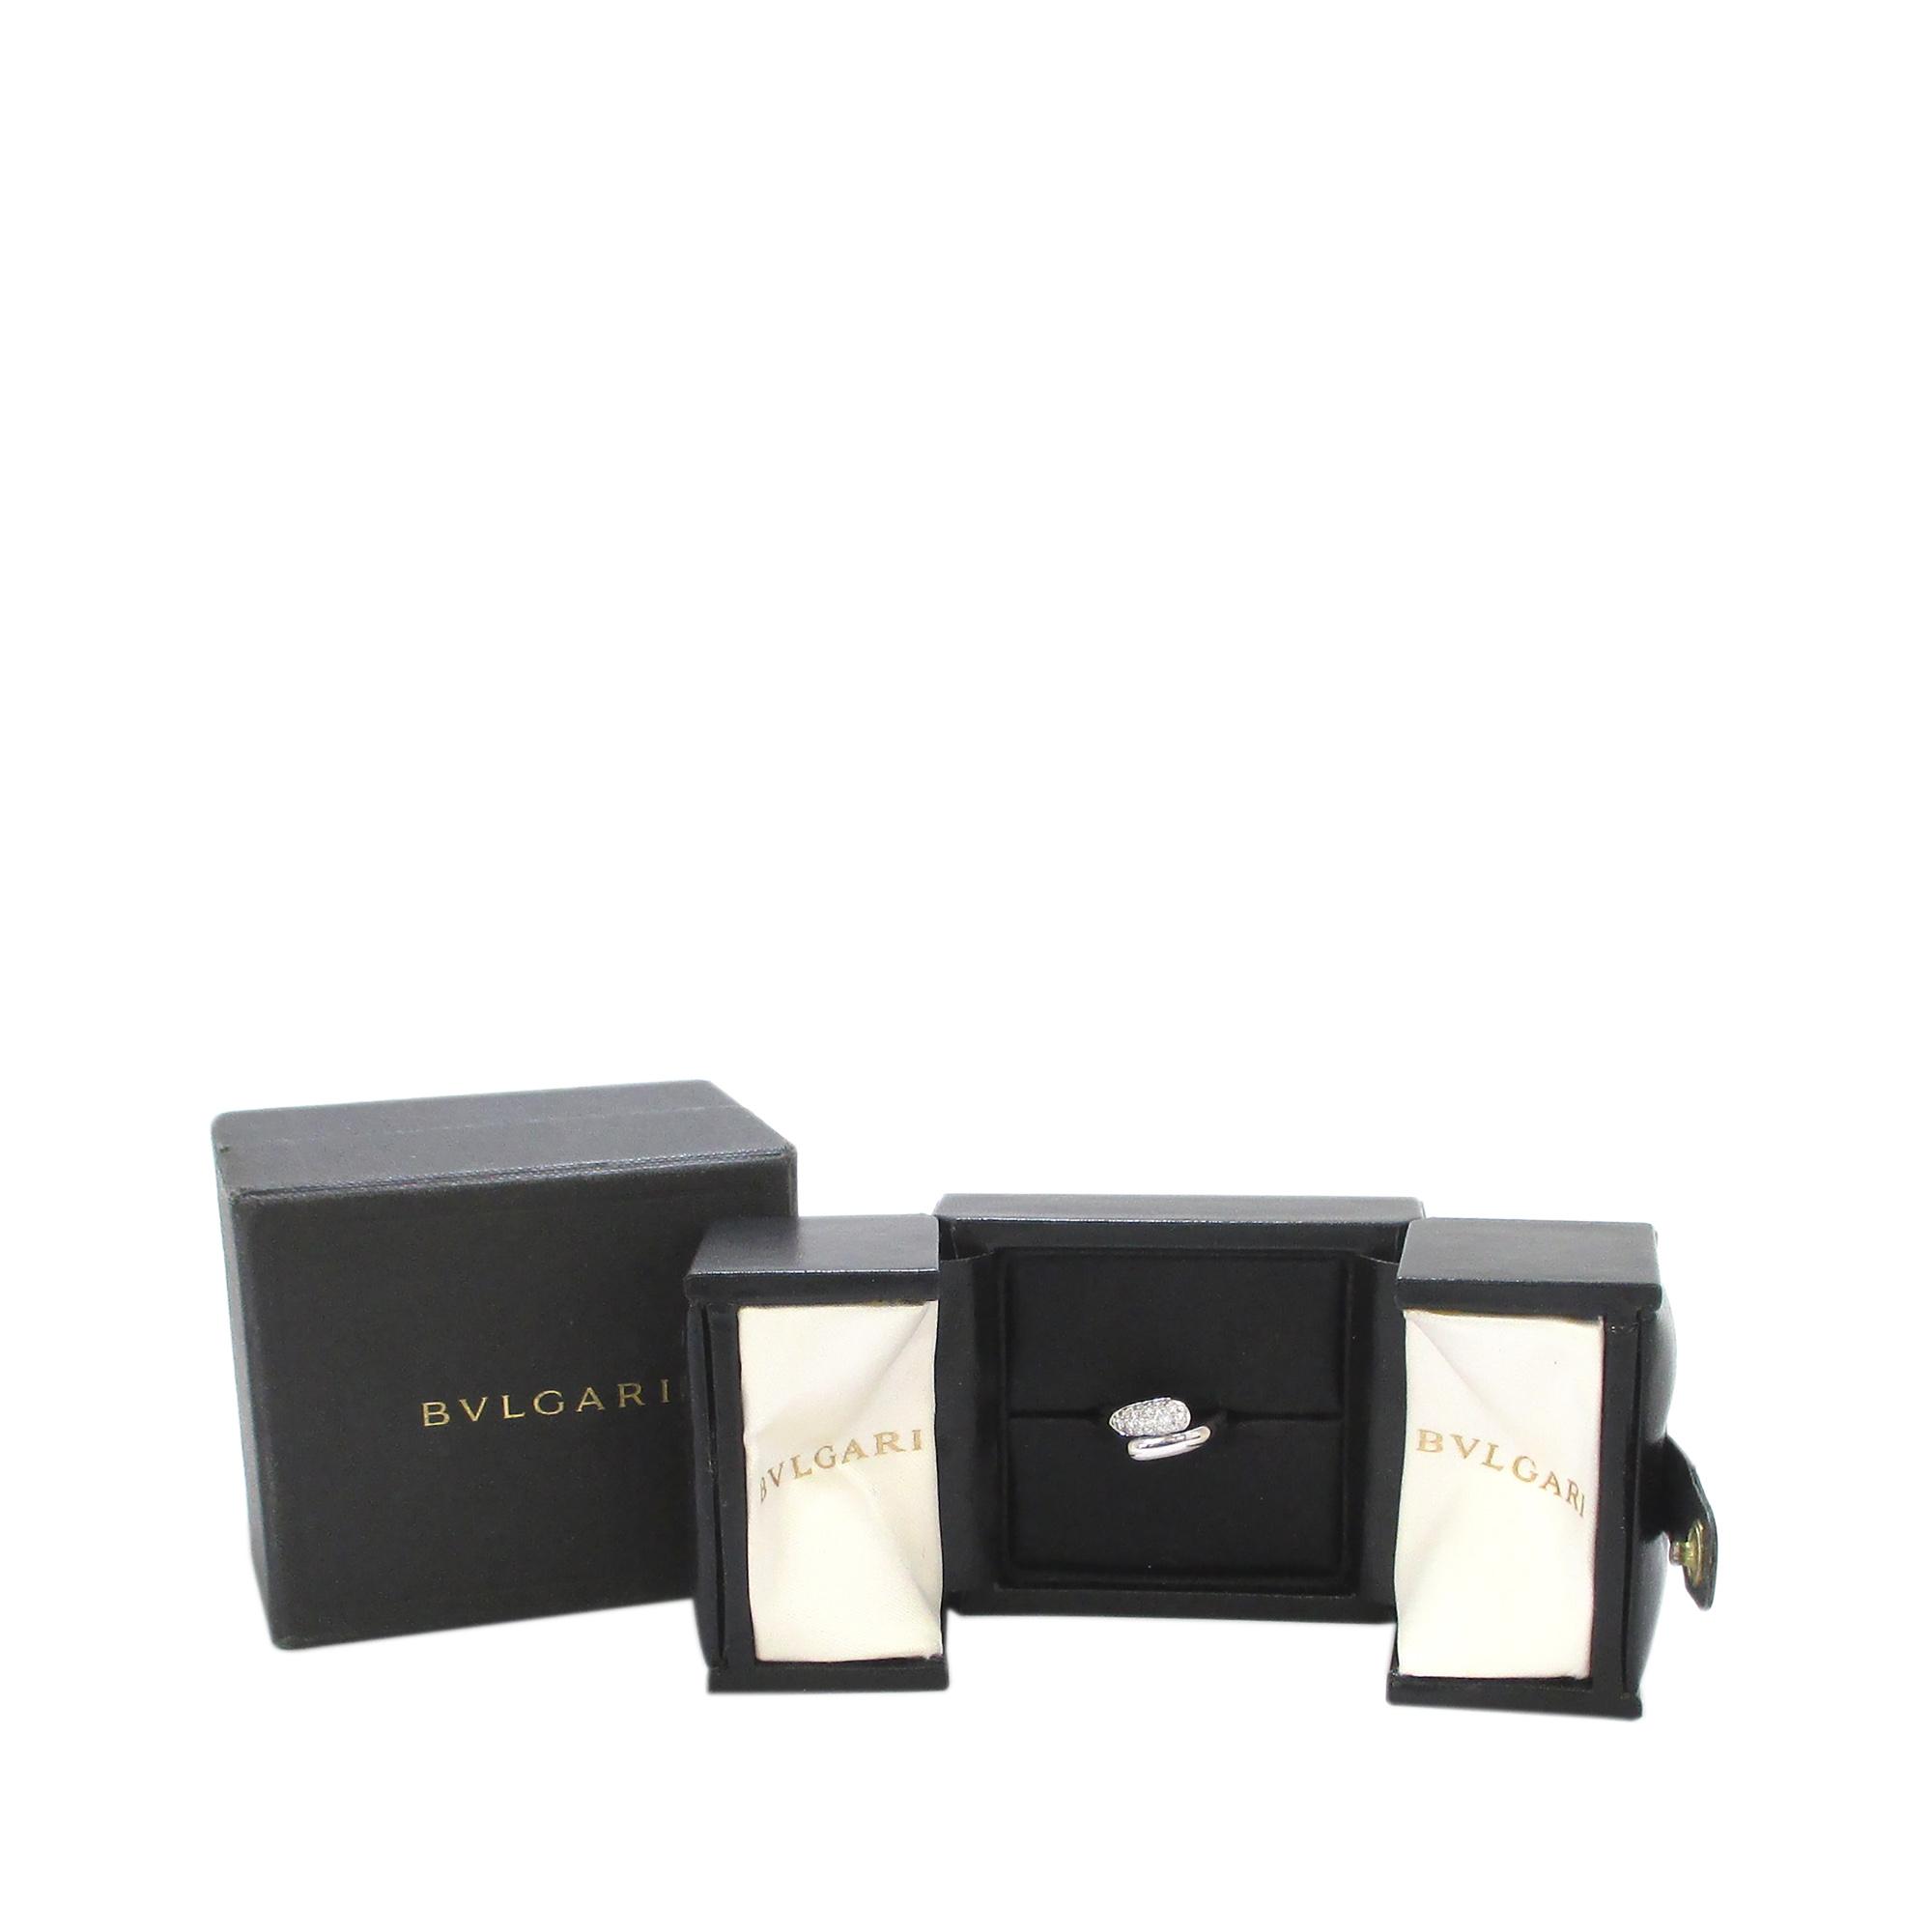 Bvlgari Diamond Pavé White Gold Ring Size 50